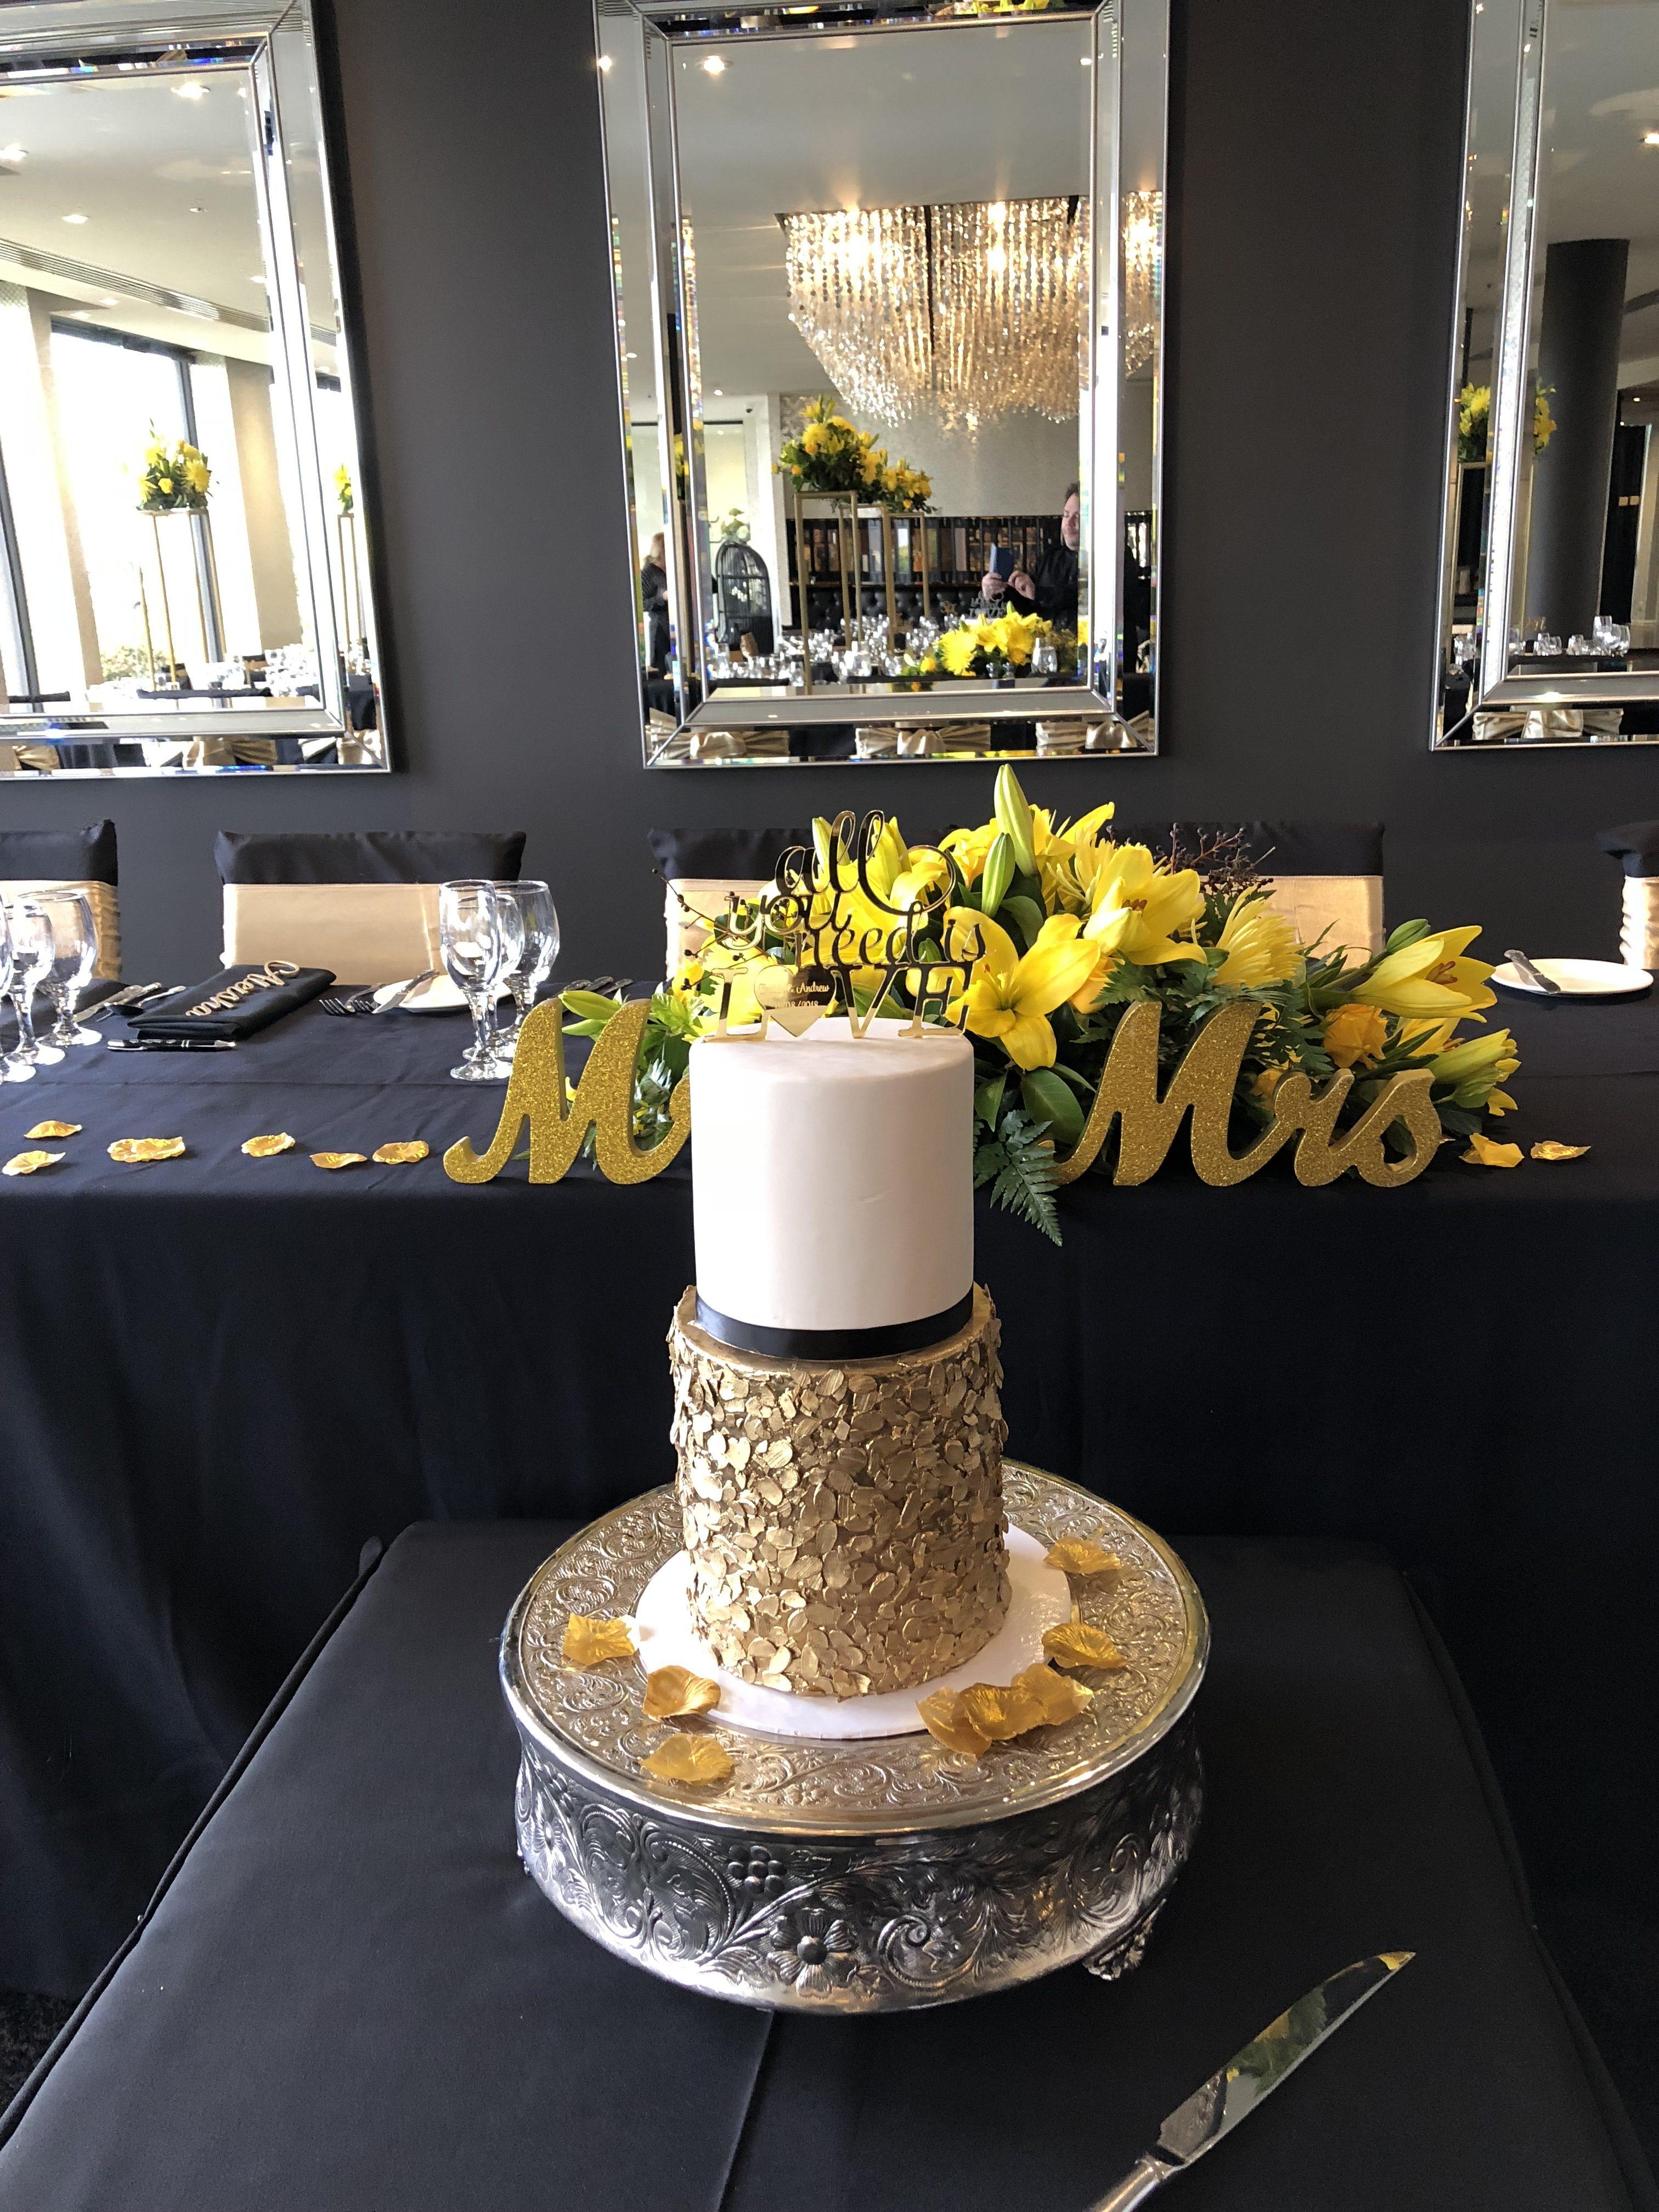 Top 10 wedding cake suppliers in melbourne brighton savoy 3utique cake art junglespirit Choice Image